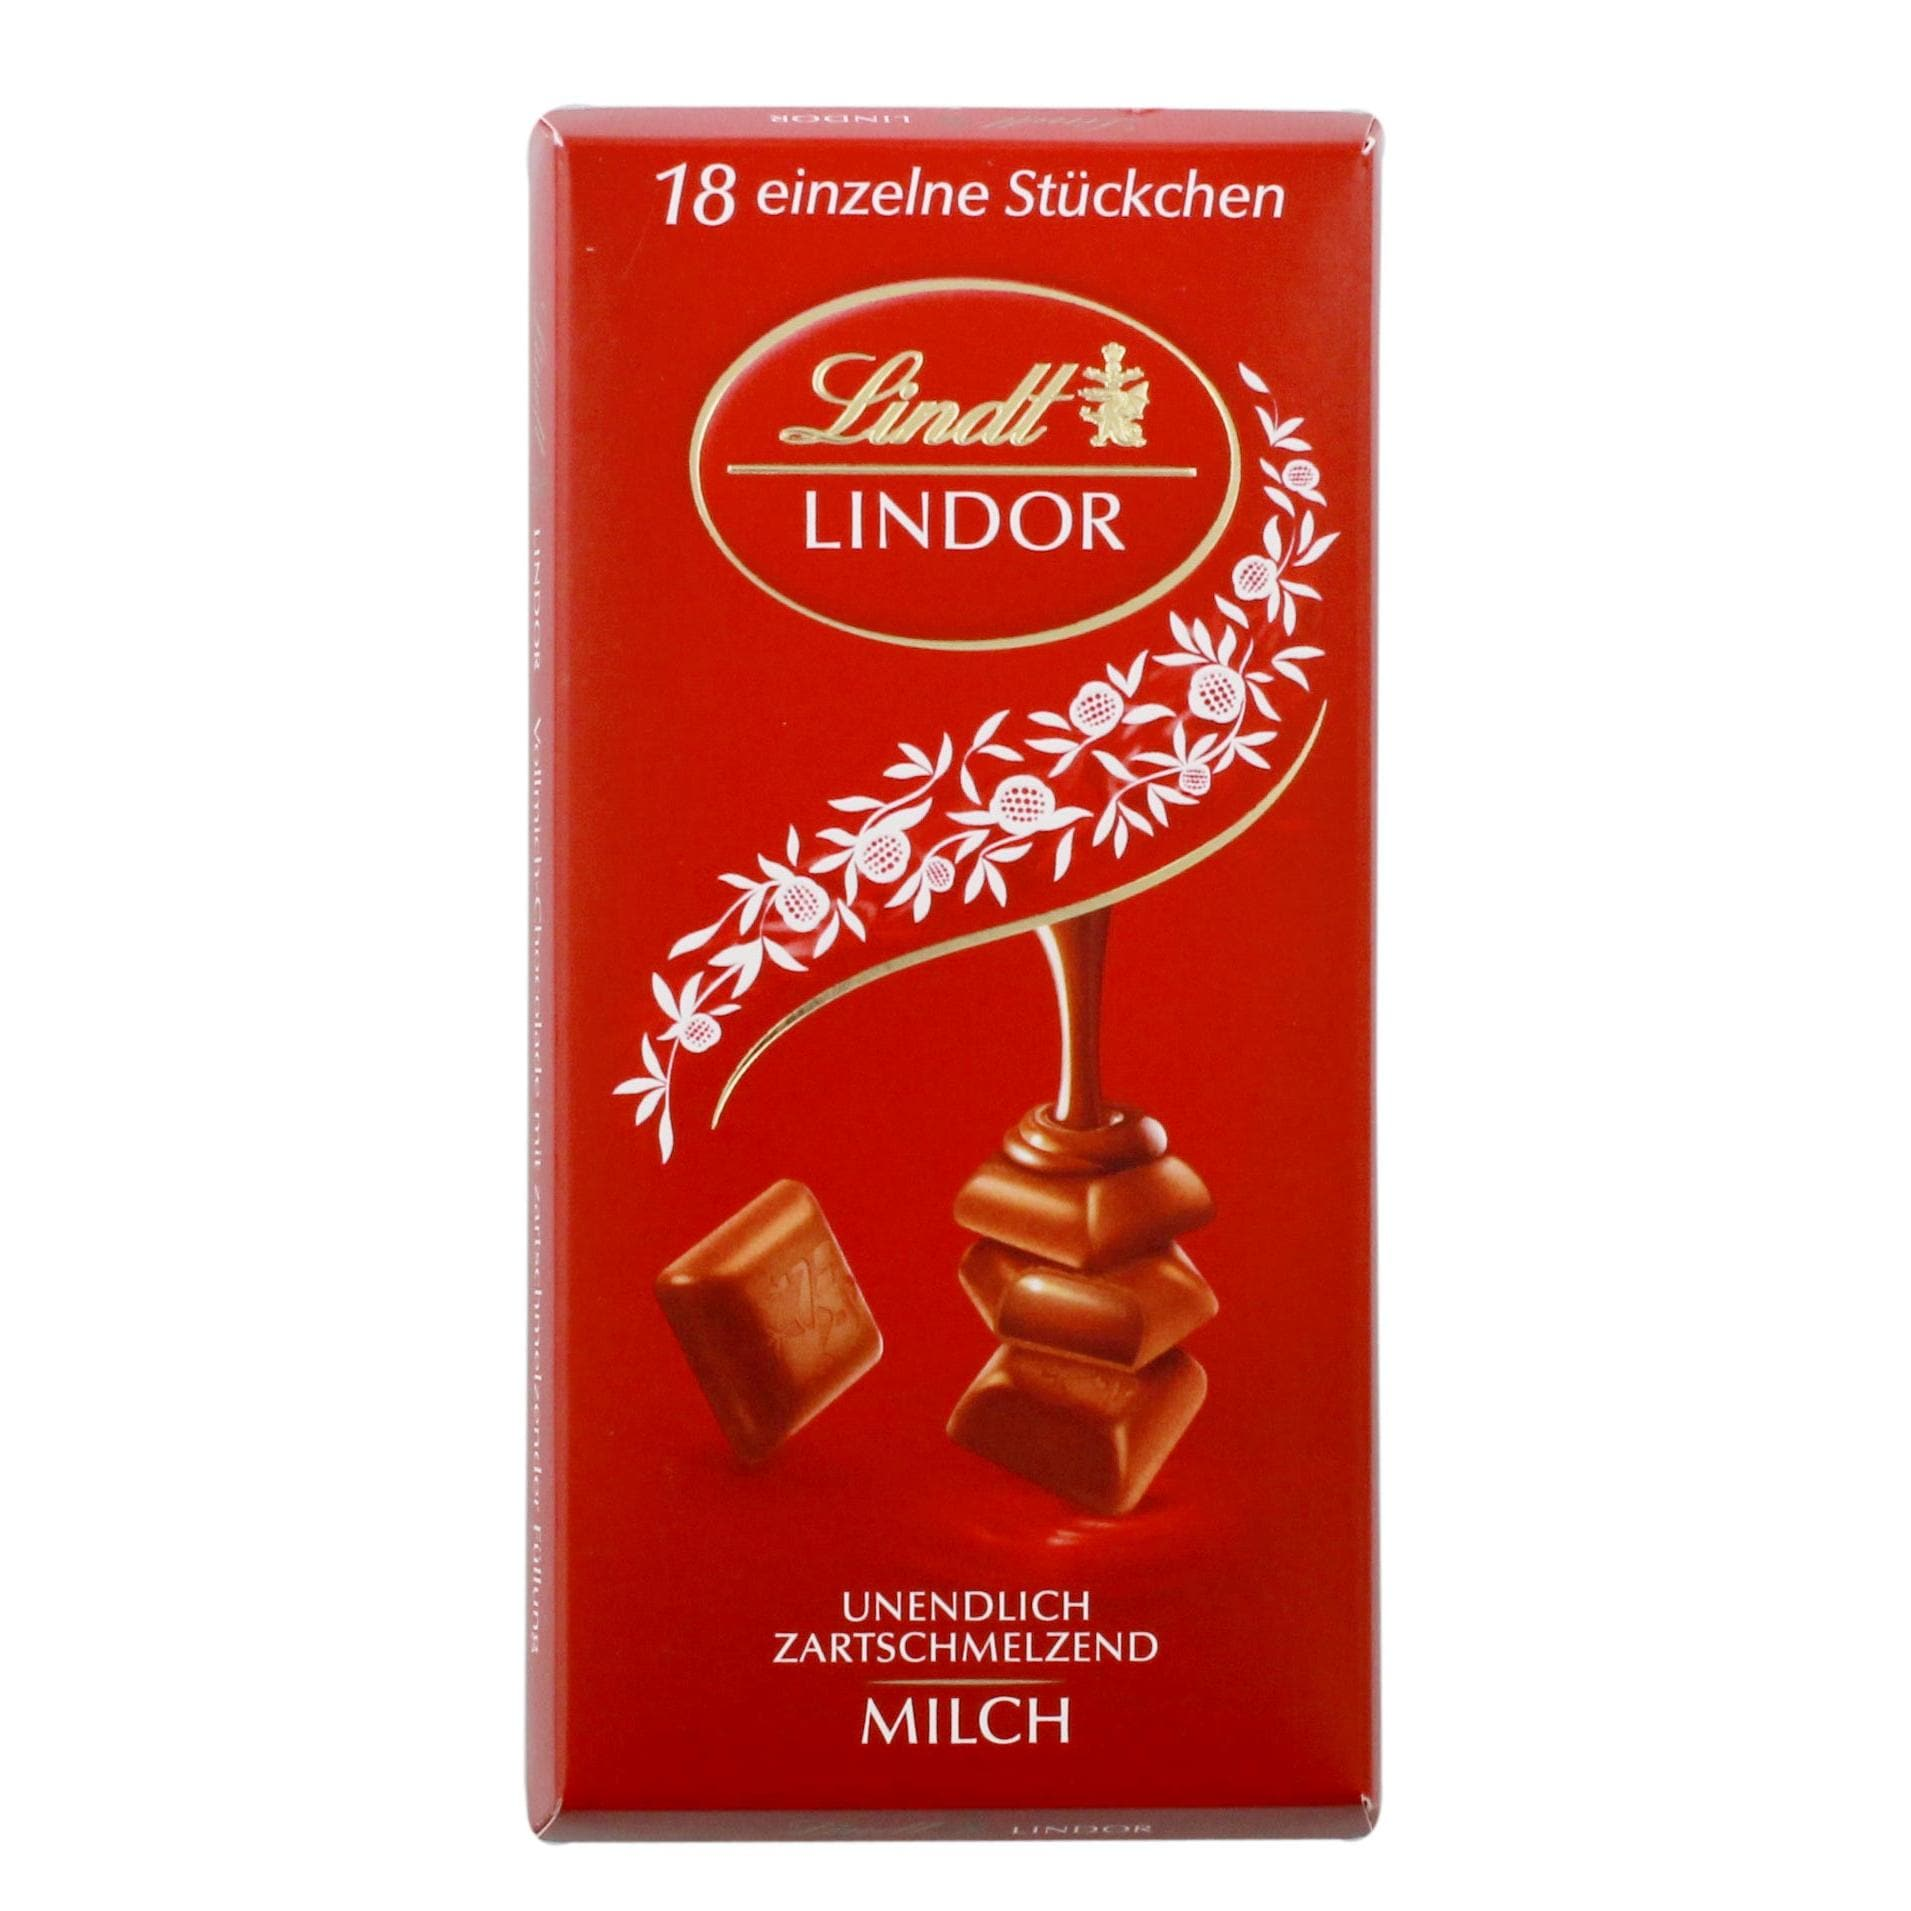 Lindt - Lindor Vollmilch Schokolade Pralinen Stückchen - 18St/100g